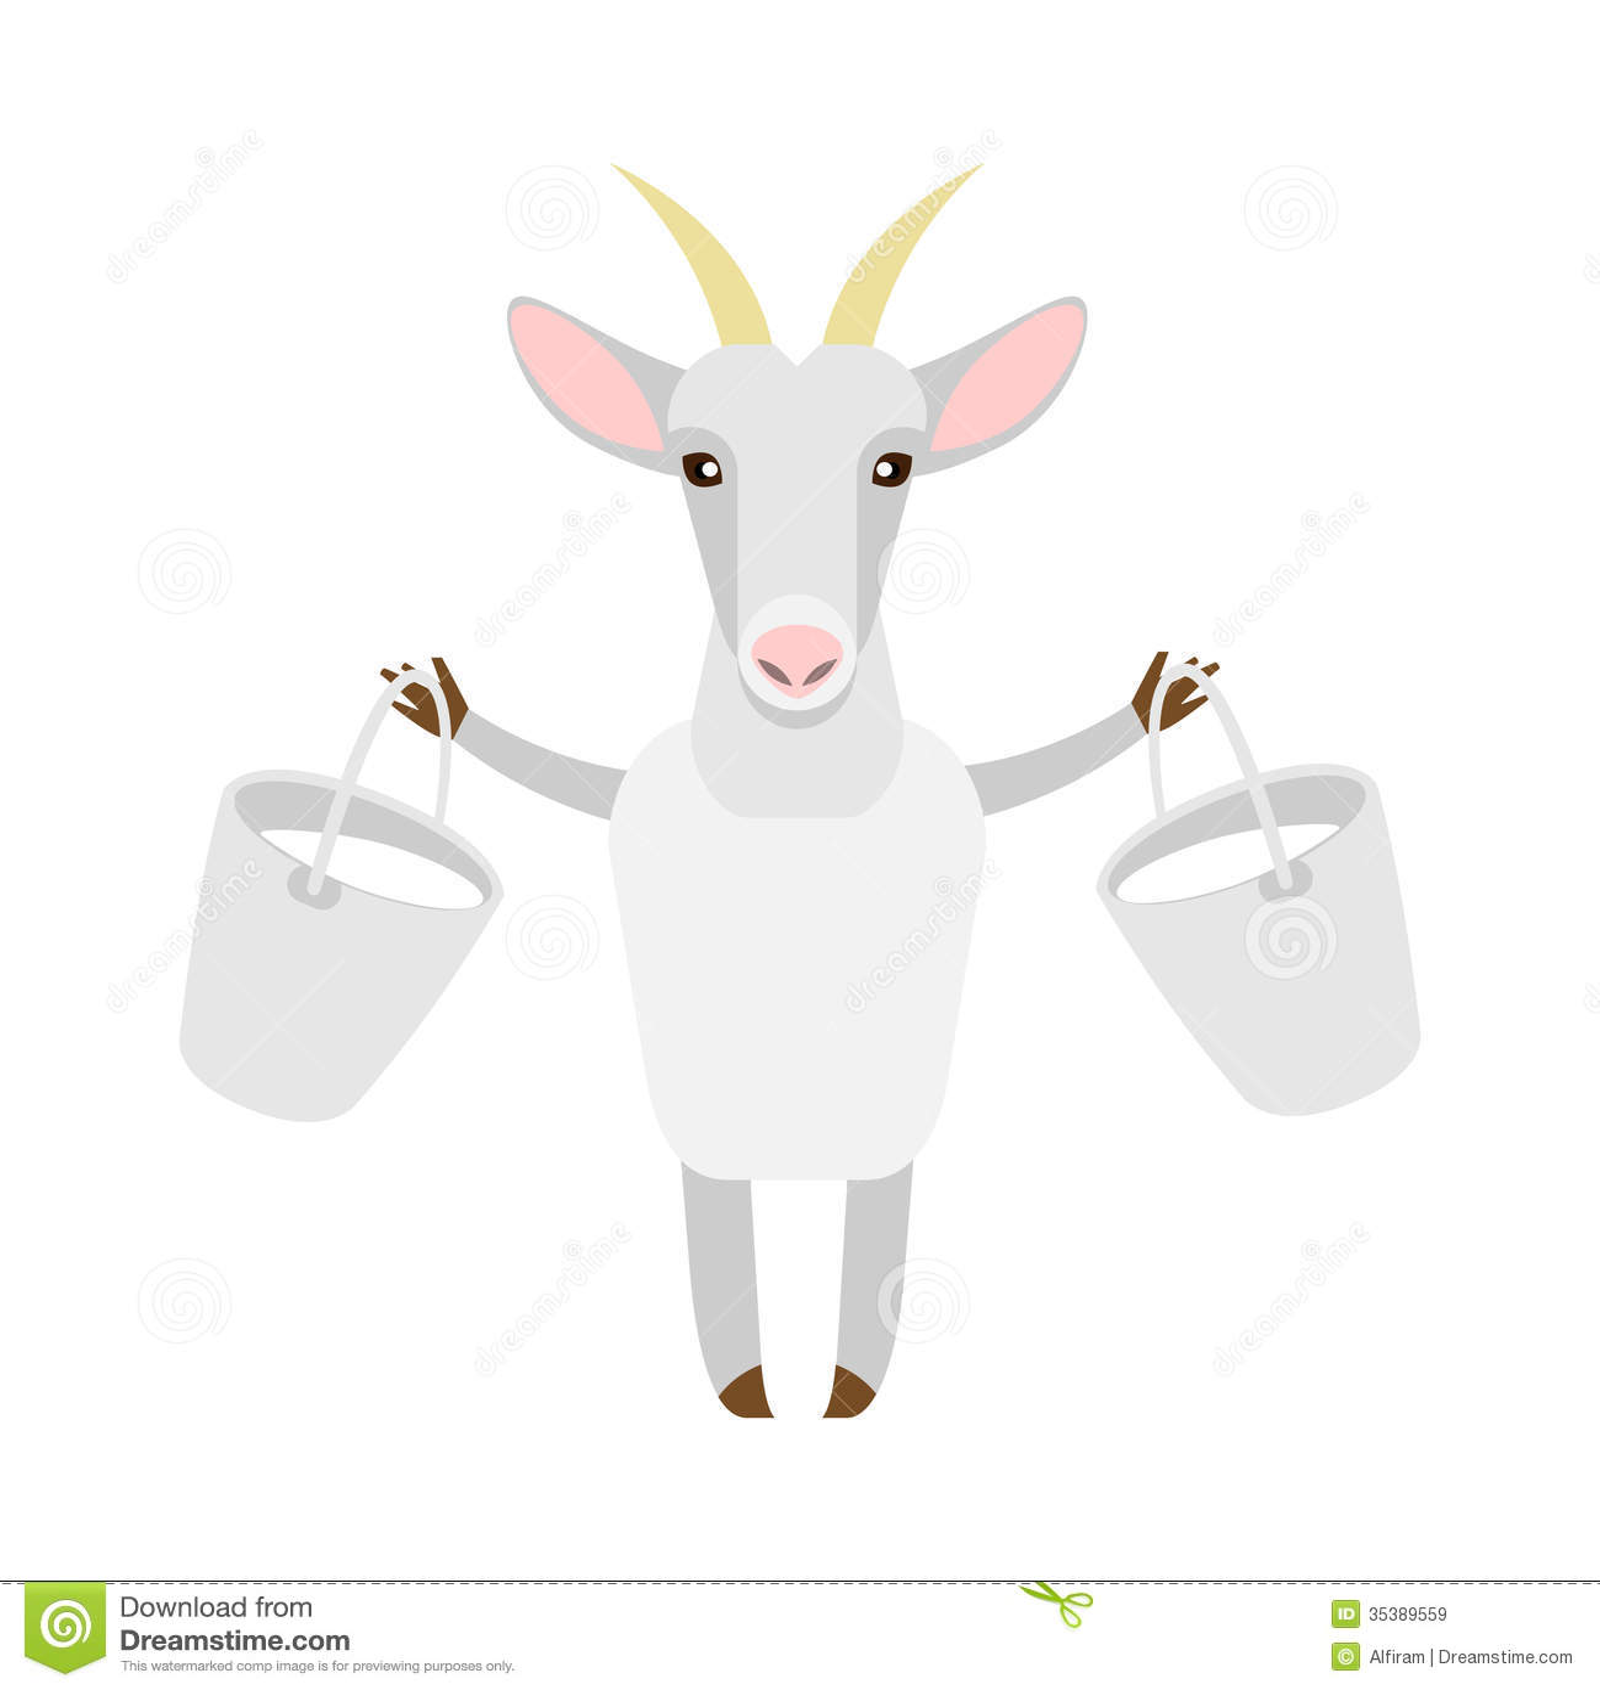 Goat with milk Goat Animation